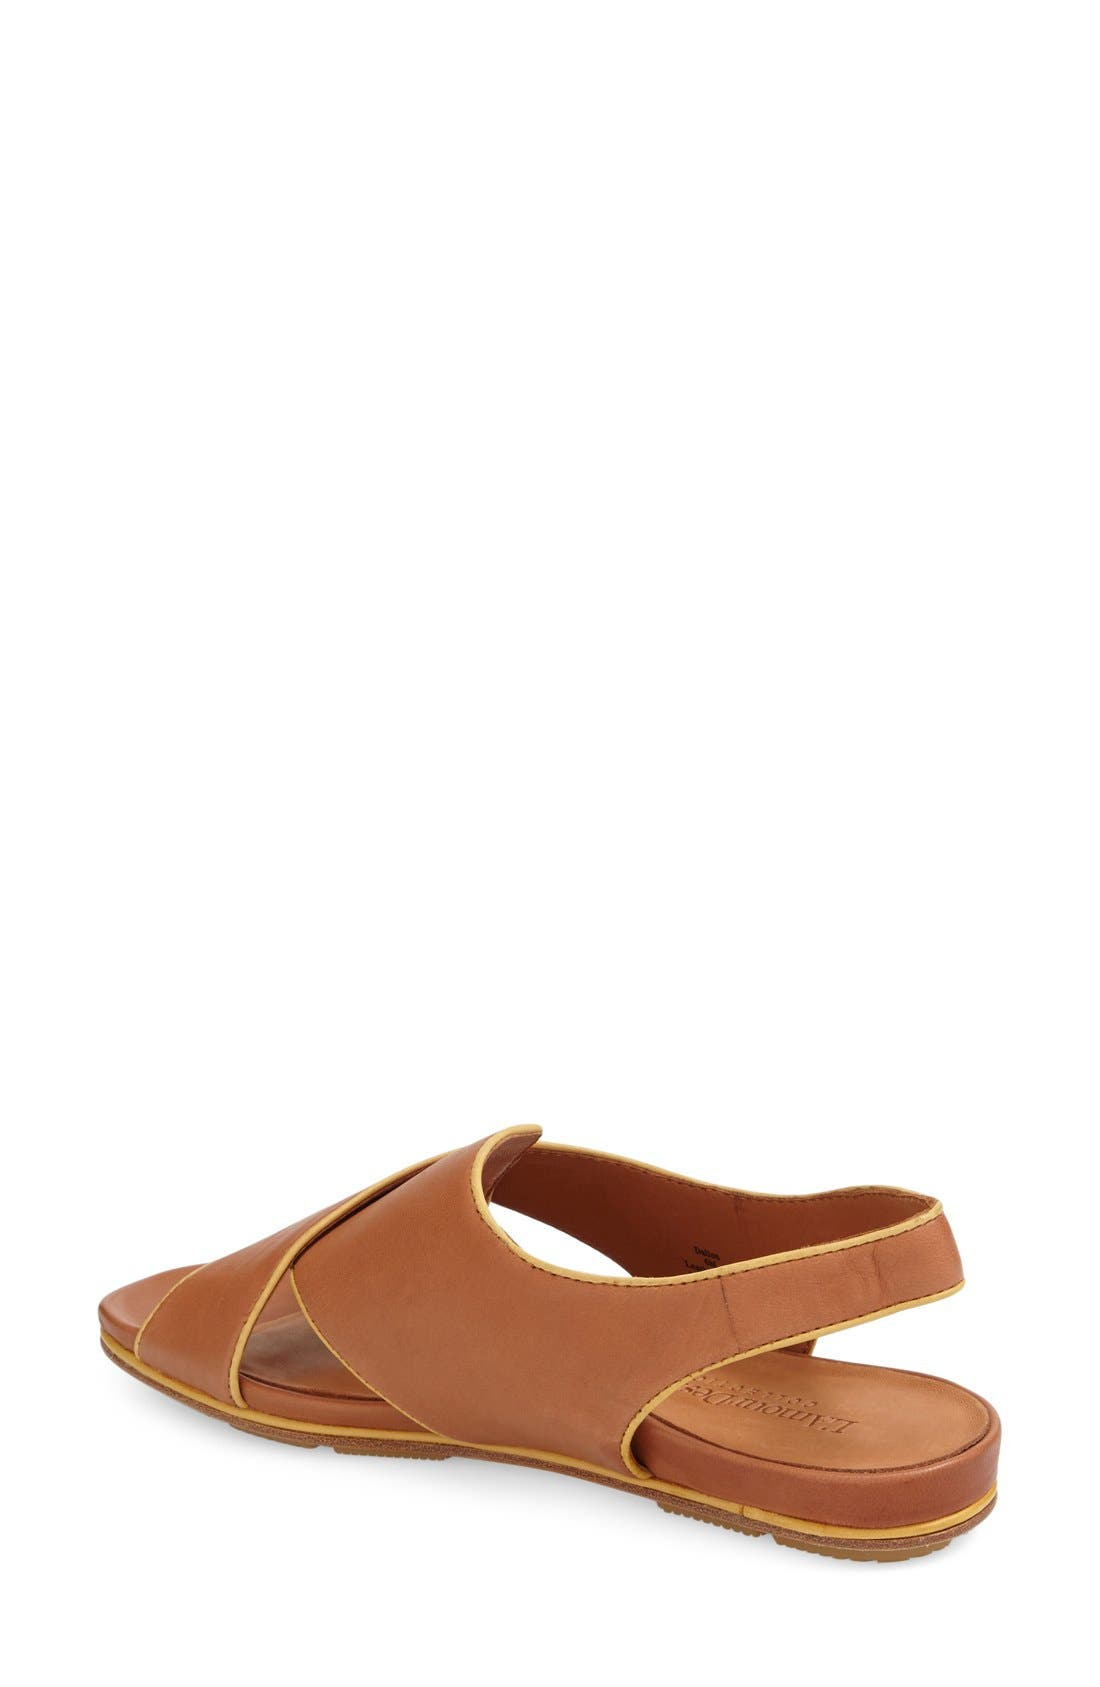 'Dallon' Crisscross Flat Sandal,                             Alternate thumbnail 2, color,                             Cognac Leather